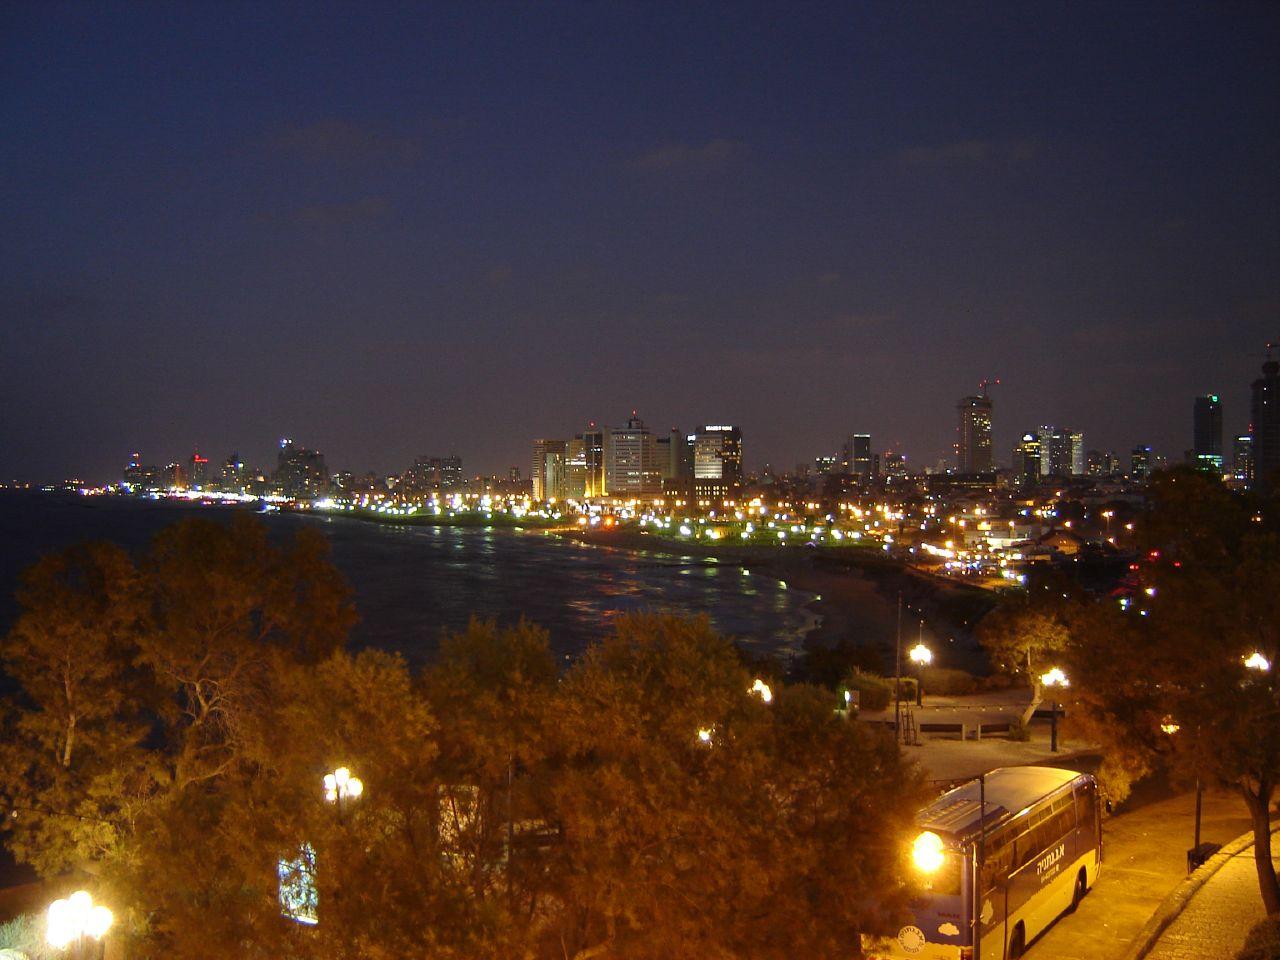 Mifrats Shlomo Promenade